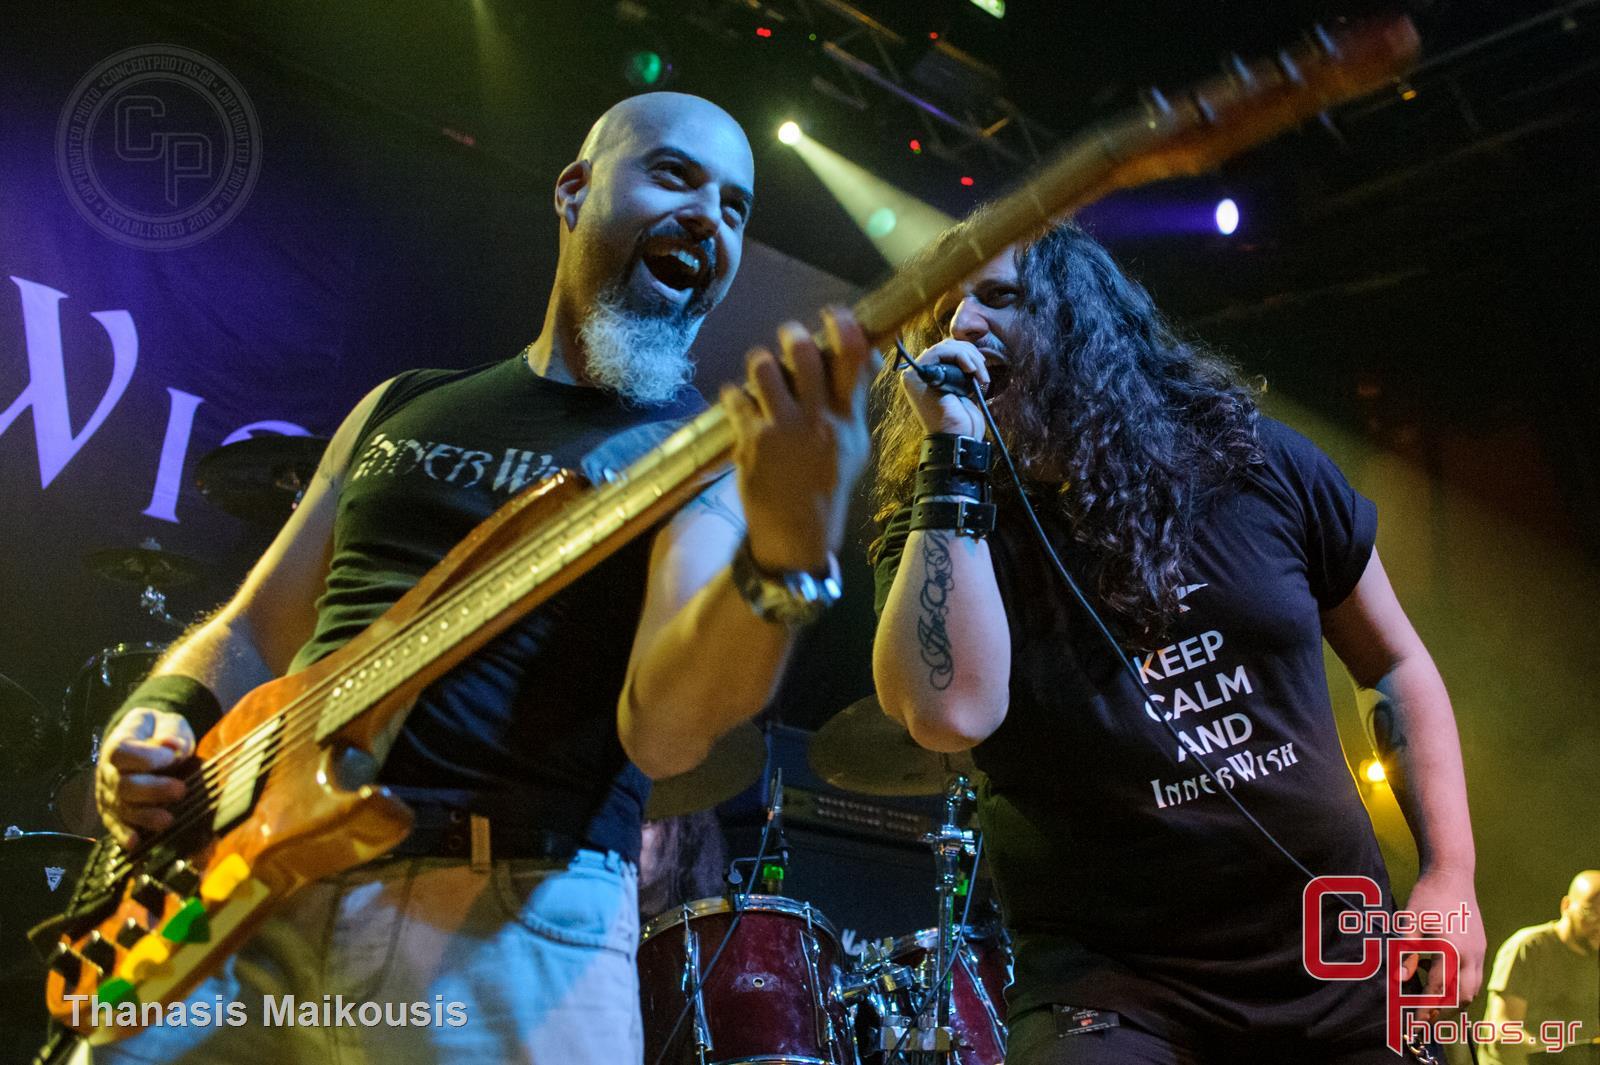 Saxon & Innerwish -Saxon Innerwish Gagarin photographer: Thanasis Maikousis - concertphotos_20141025_21_09_46